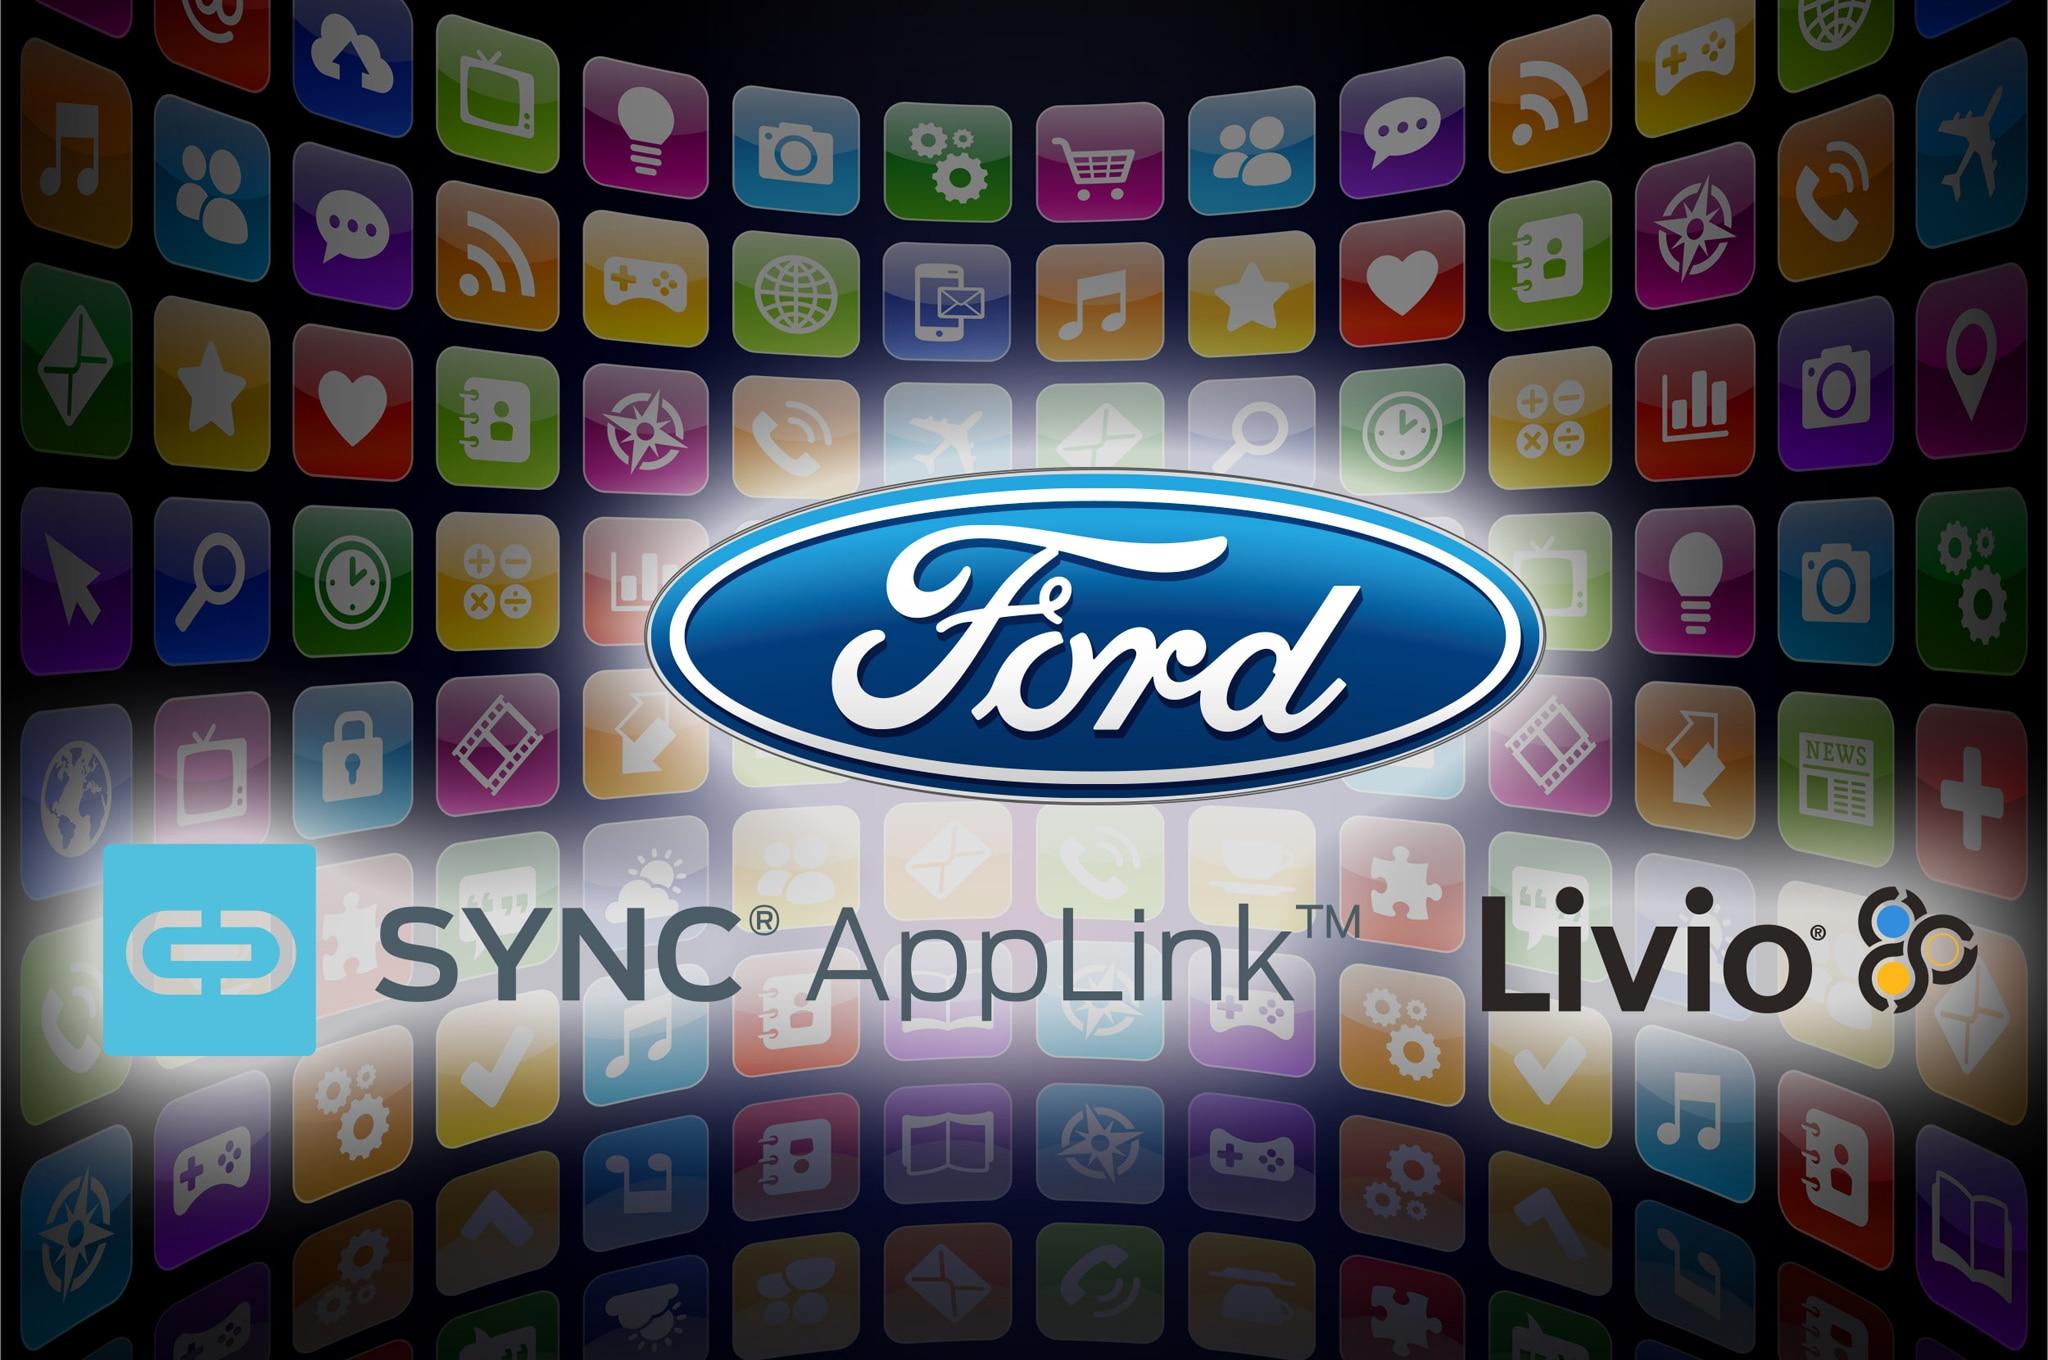 Ford Livio Announcement1